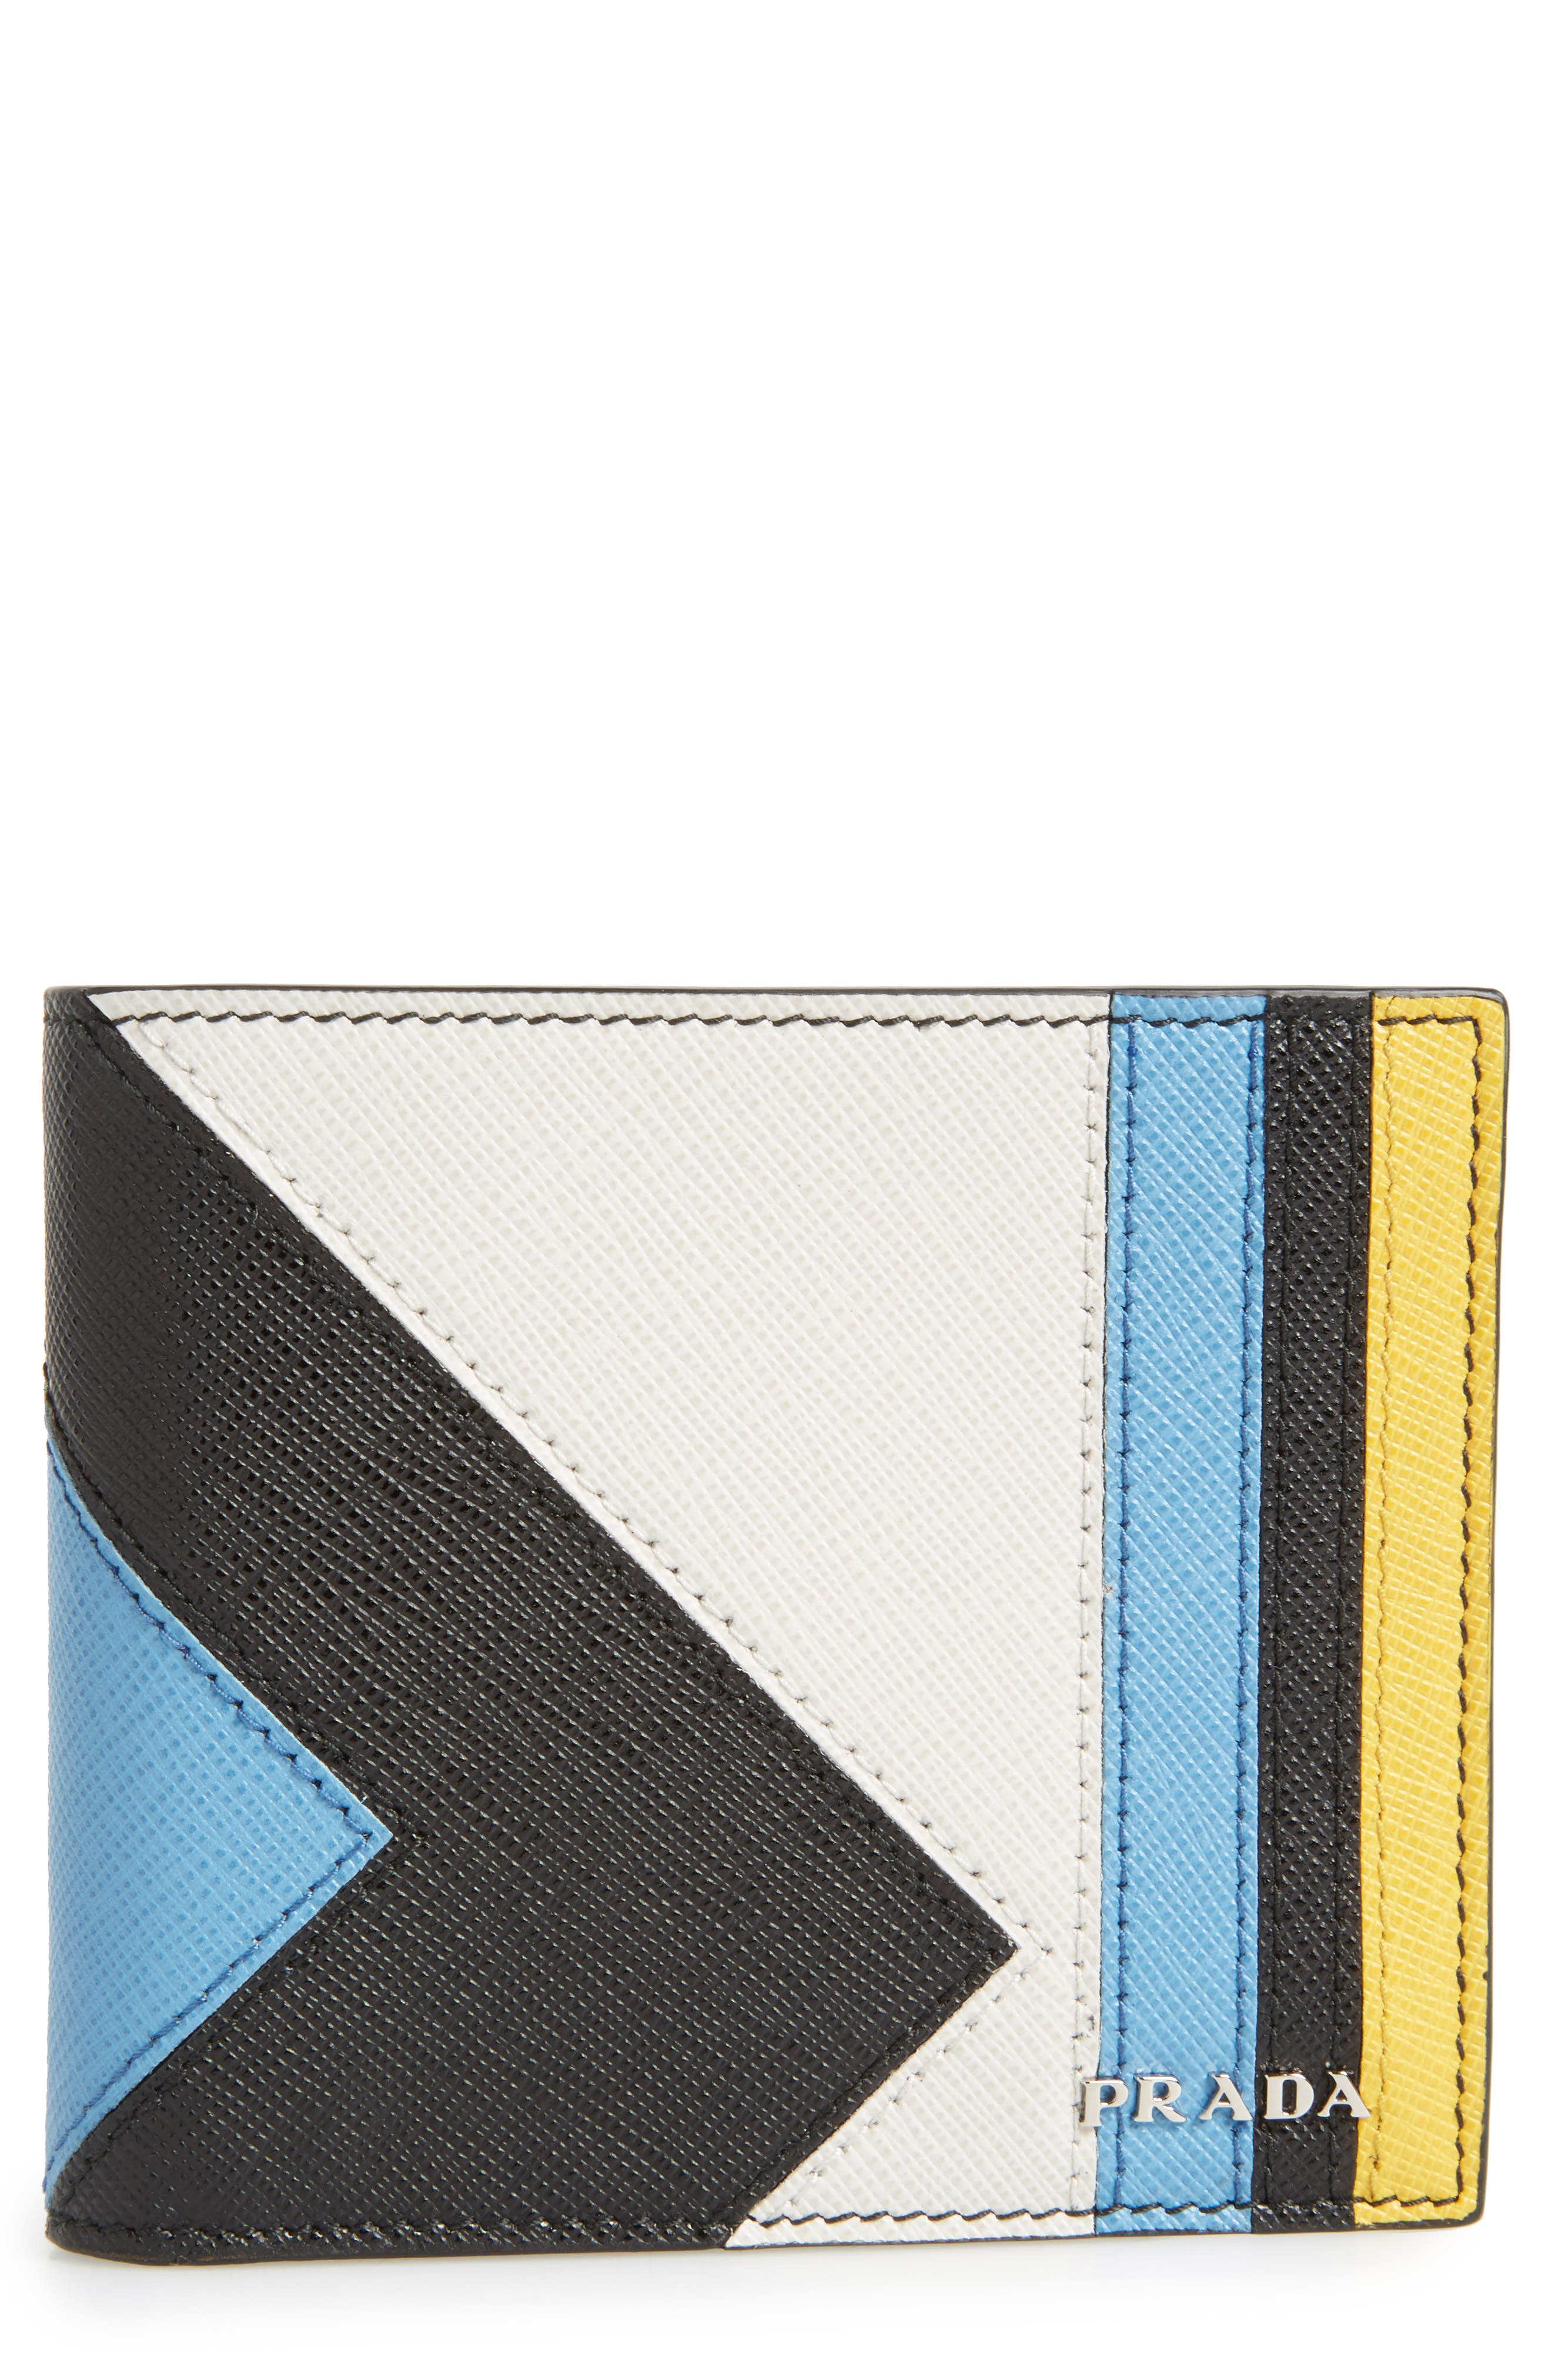 Alternate Image 1 Selected - Prada Arrow Calfskin Leather Wallet